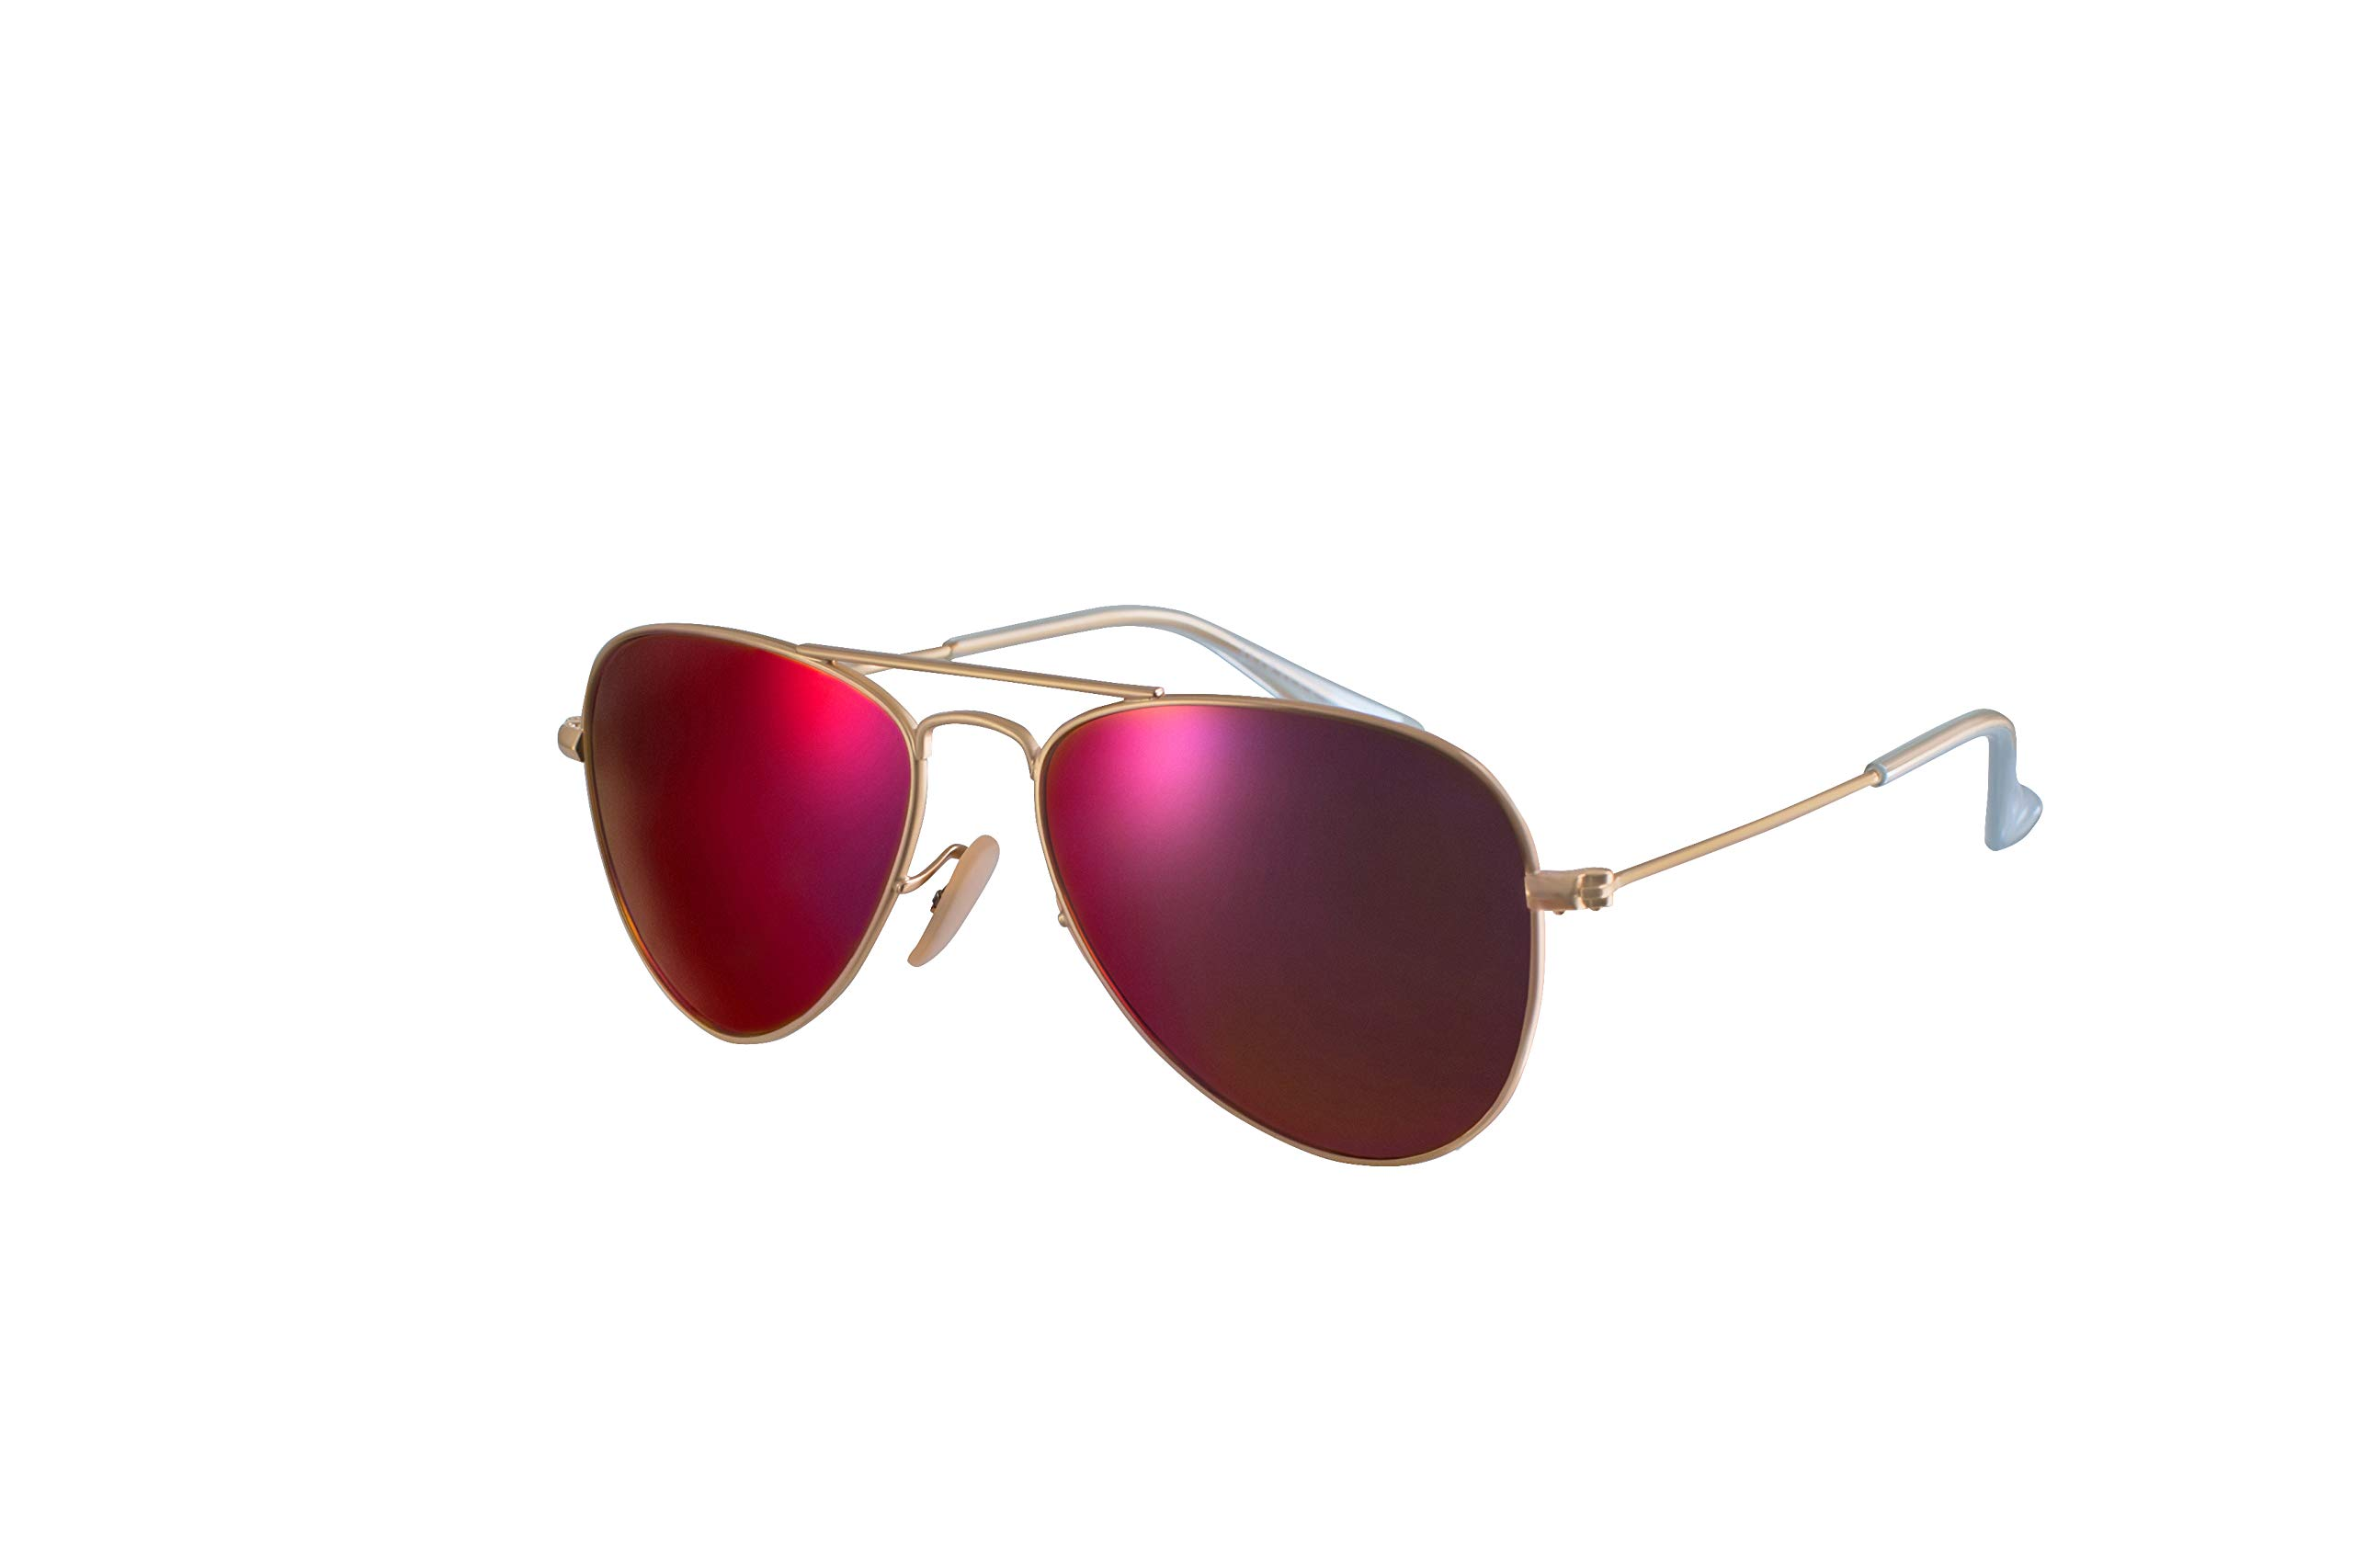 Ali&Alex Classic Metal Aviator 100% UV Polarized Unisex Designer Sunglasses for Kids